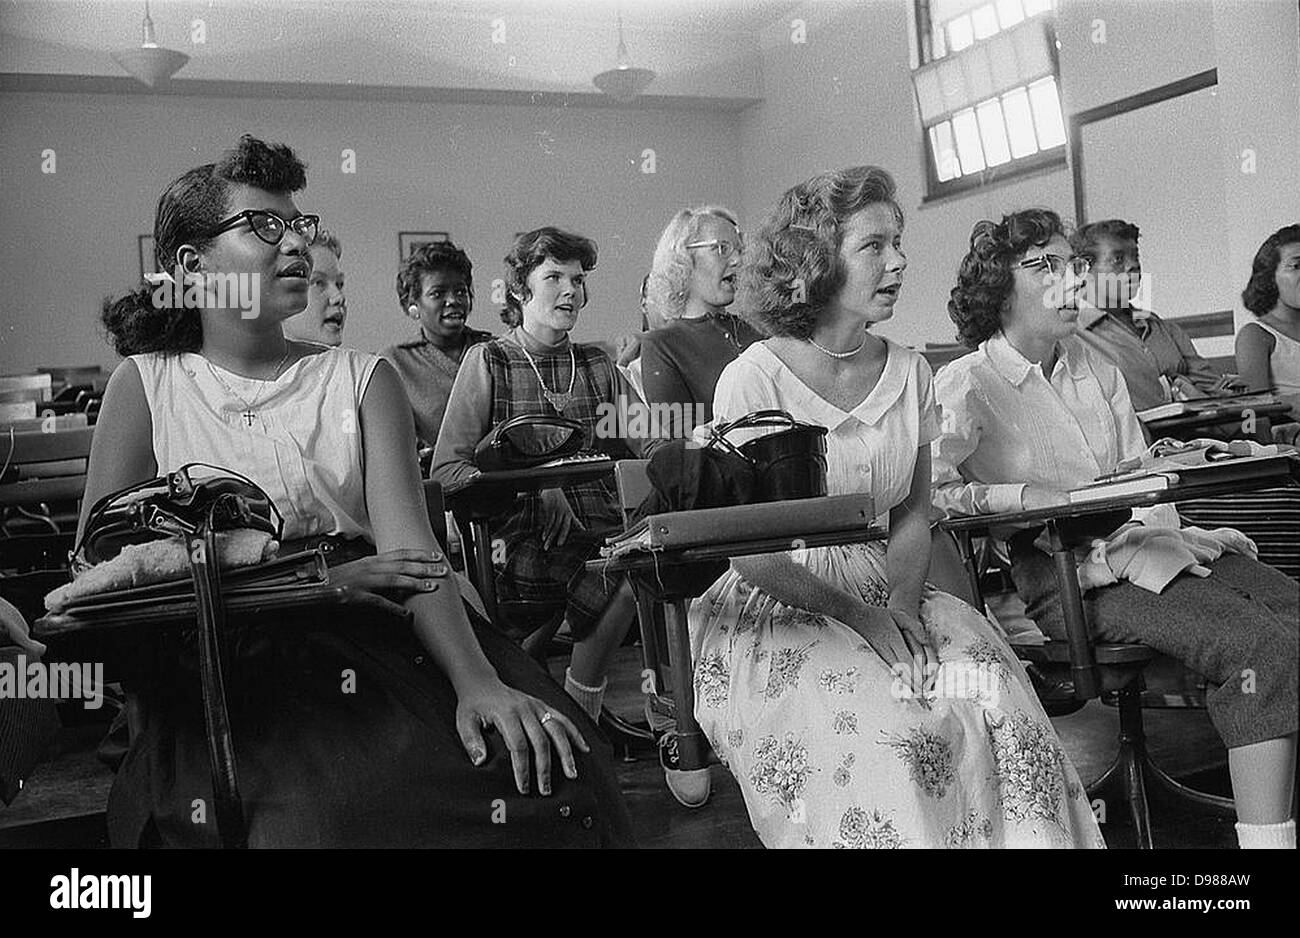 Integrated classroom at Anacostia High School, Washington, D.C., USA. 10 September 1957. Photographer: Warren K Stock Photo